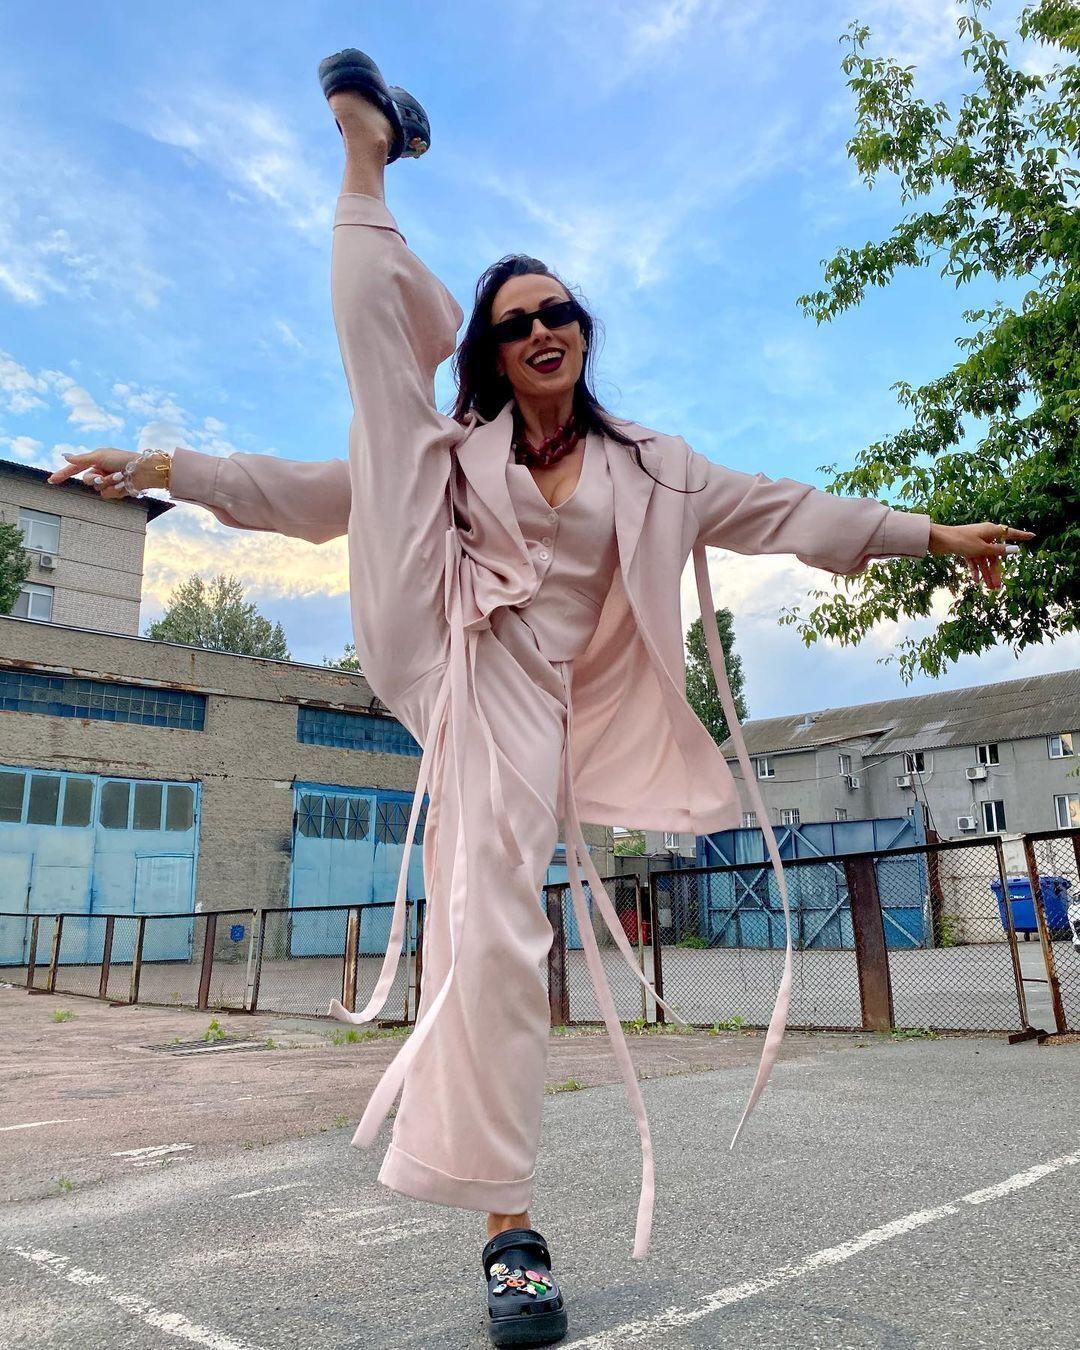 35-річна співачка Анастасія Кумейко